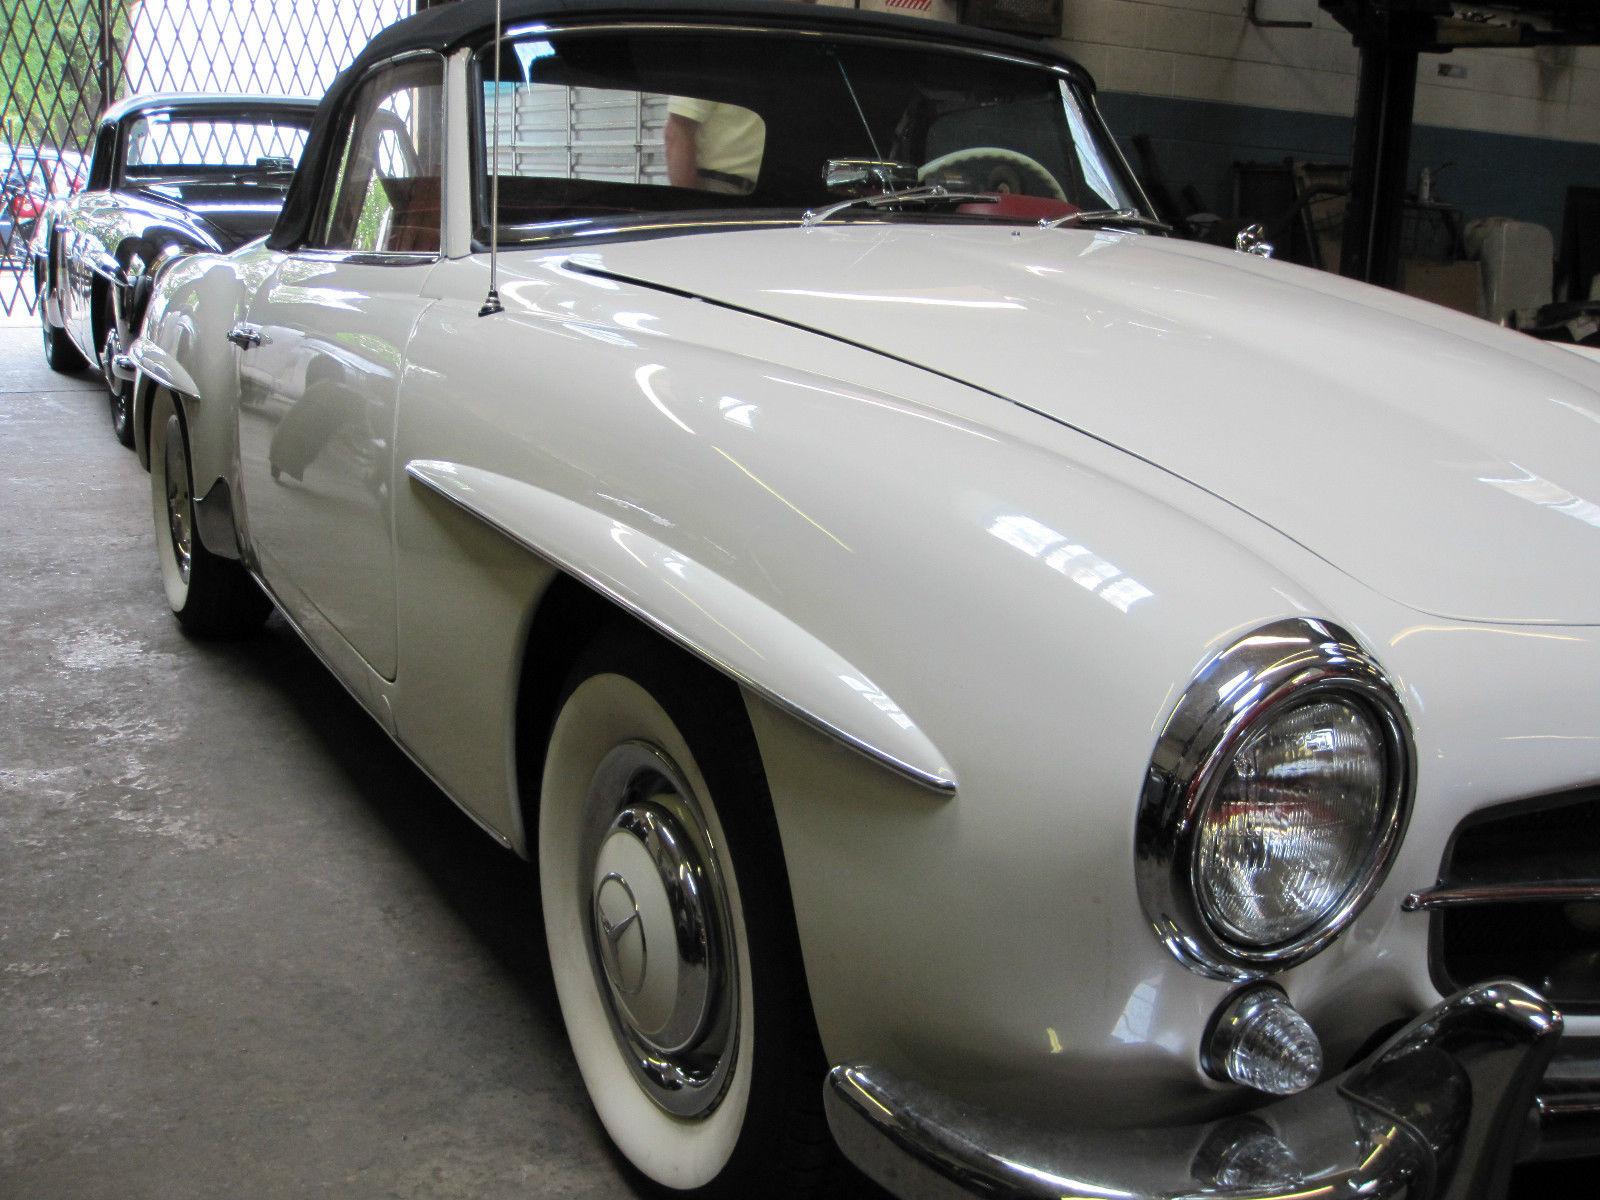 Mercedes benz 190 sl 1960 roadster hardtop classic for Mercedes benz hardtop convertible for sale